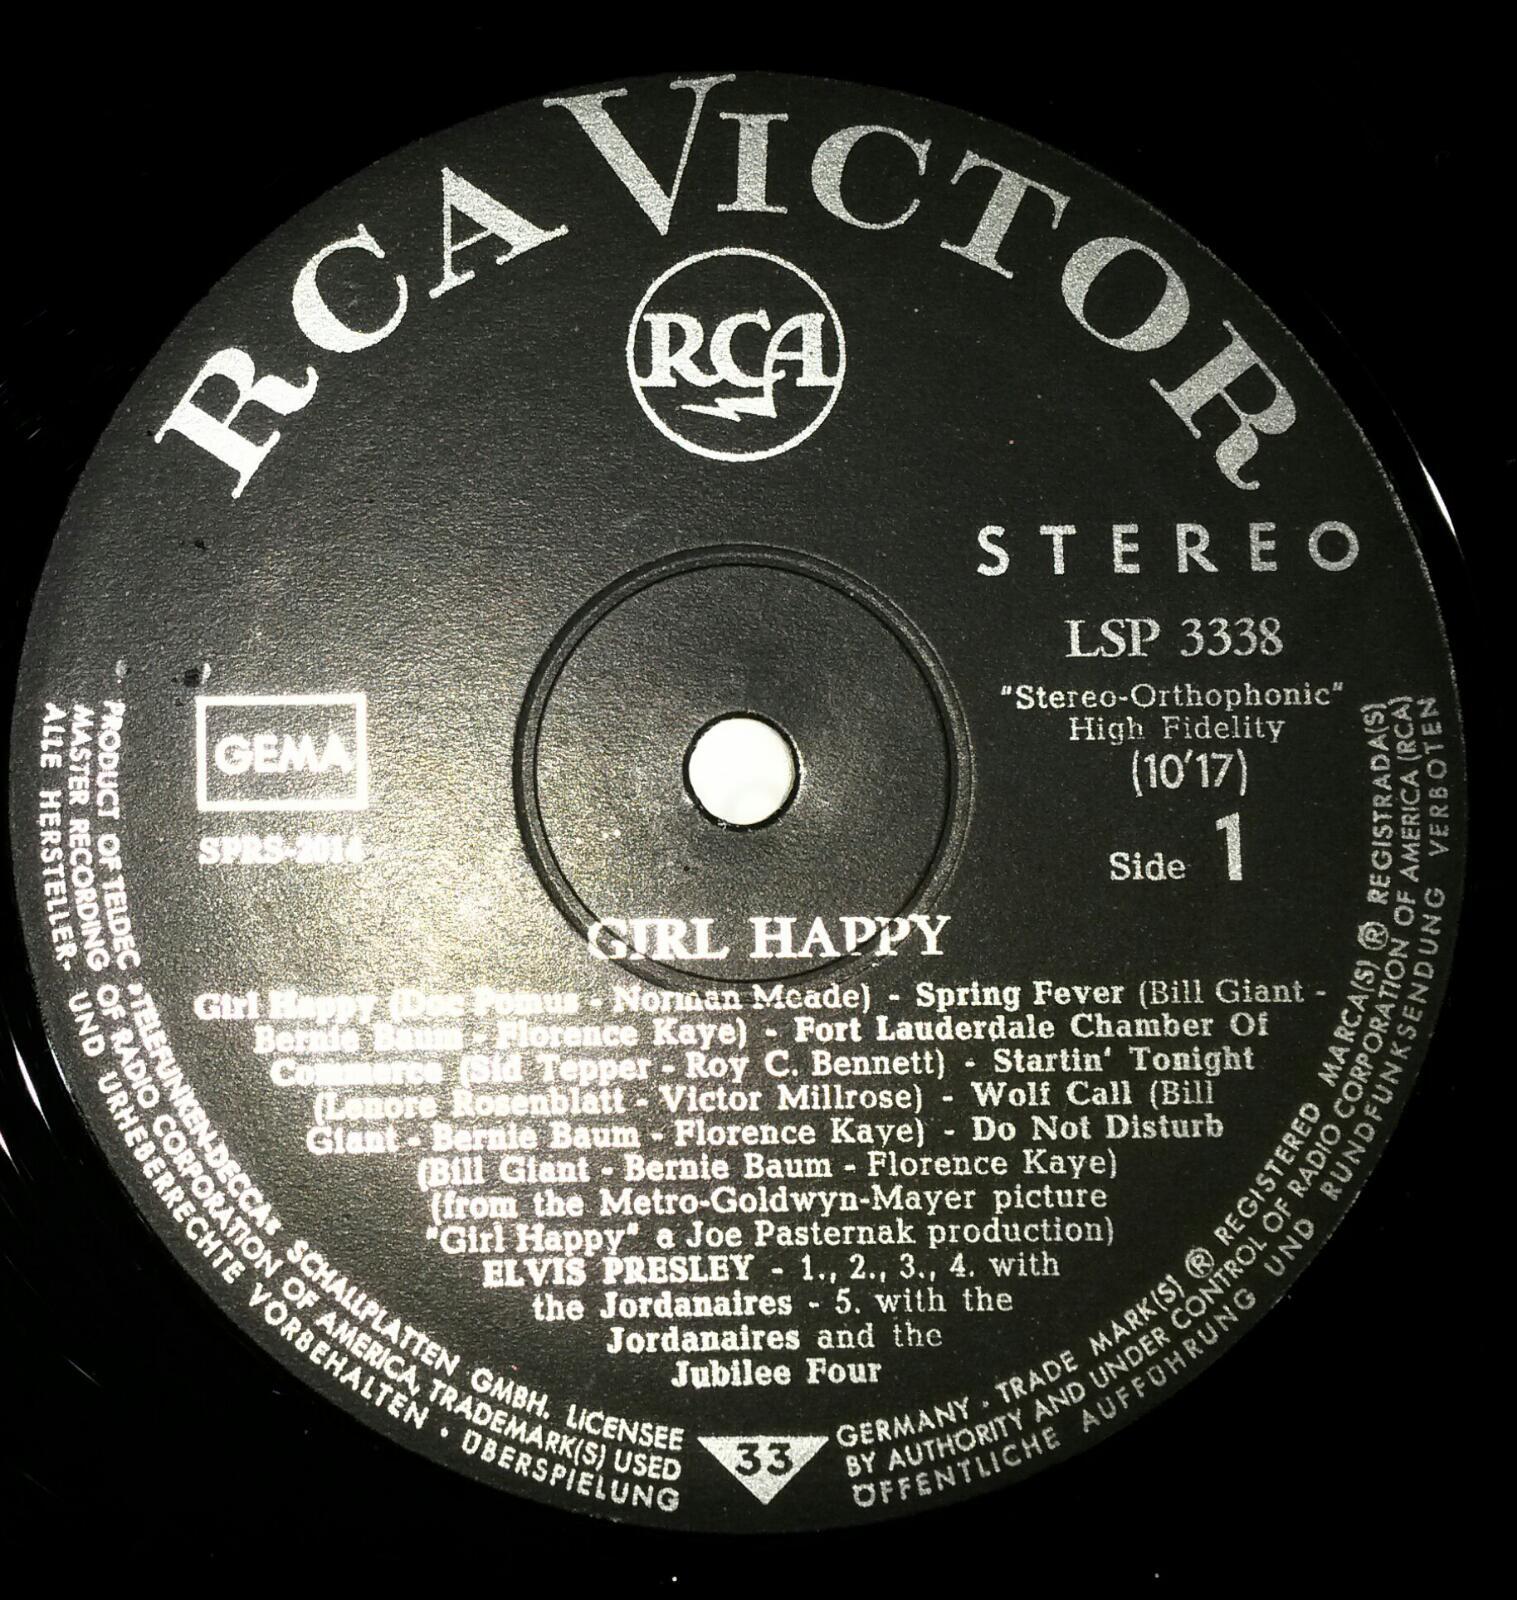 RCA LP-Label-Spiegel der Bundesrepublik Deutschland V3lljvm